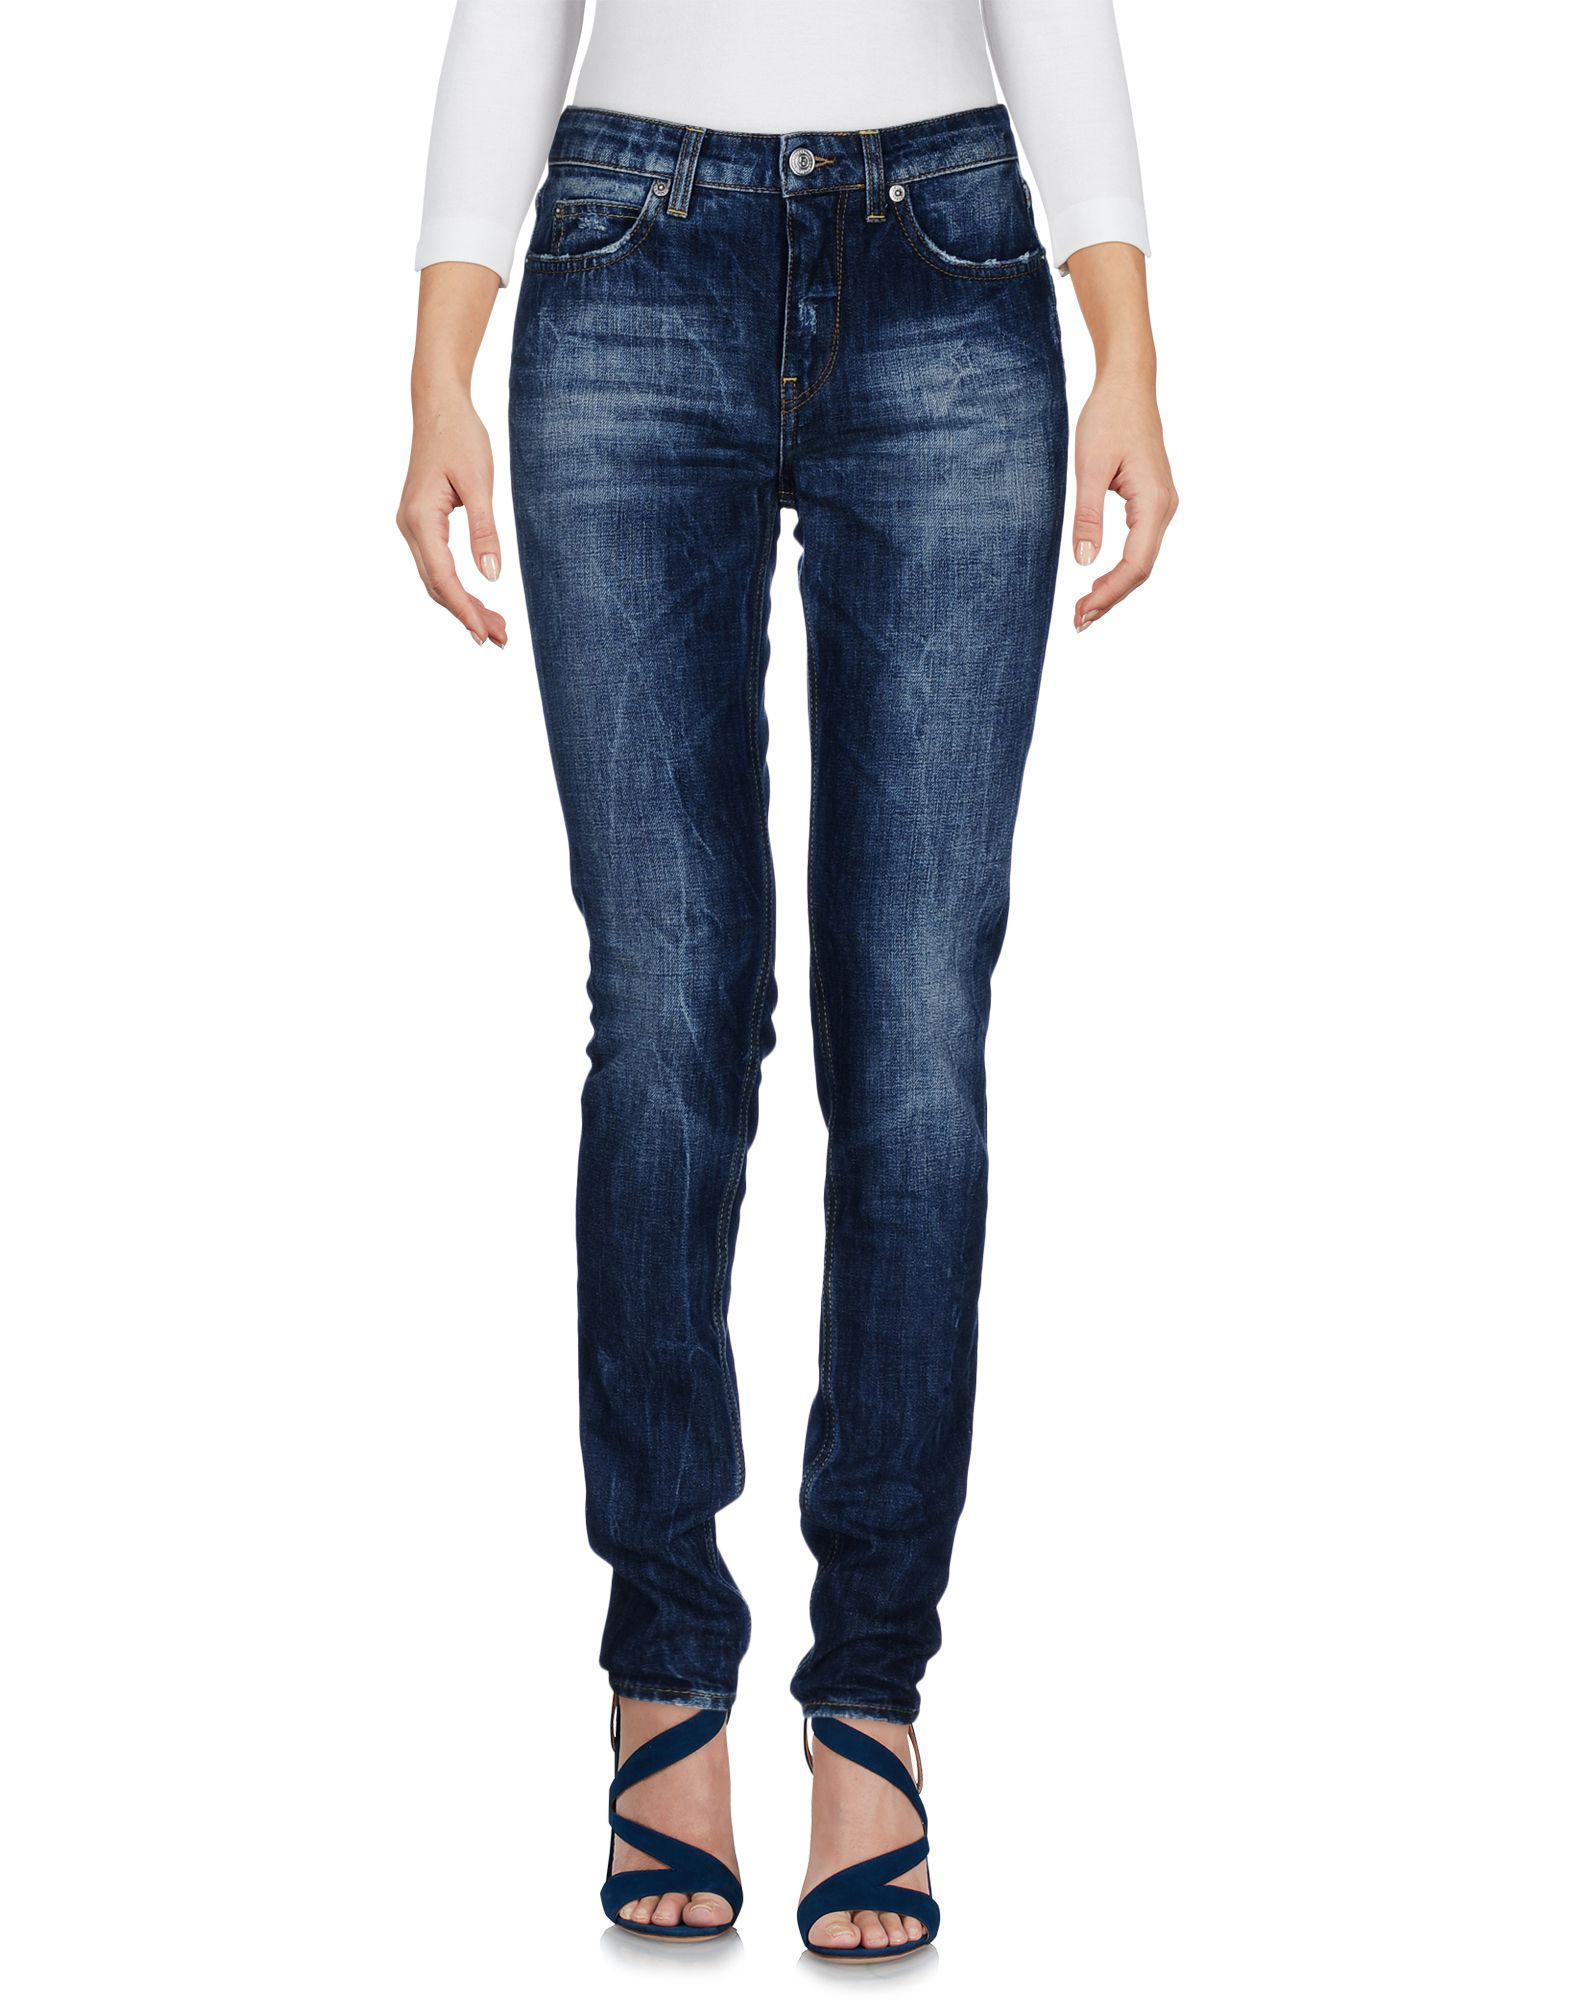 DENIM - Denim trousers Department 5 2stTYne